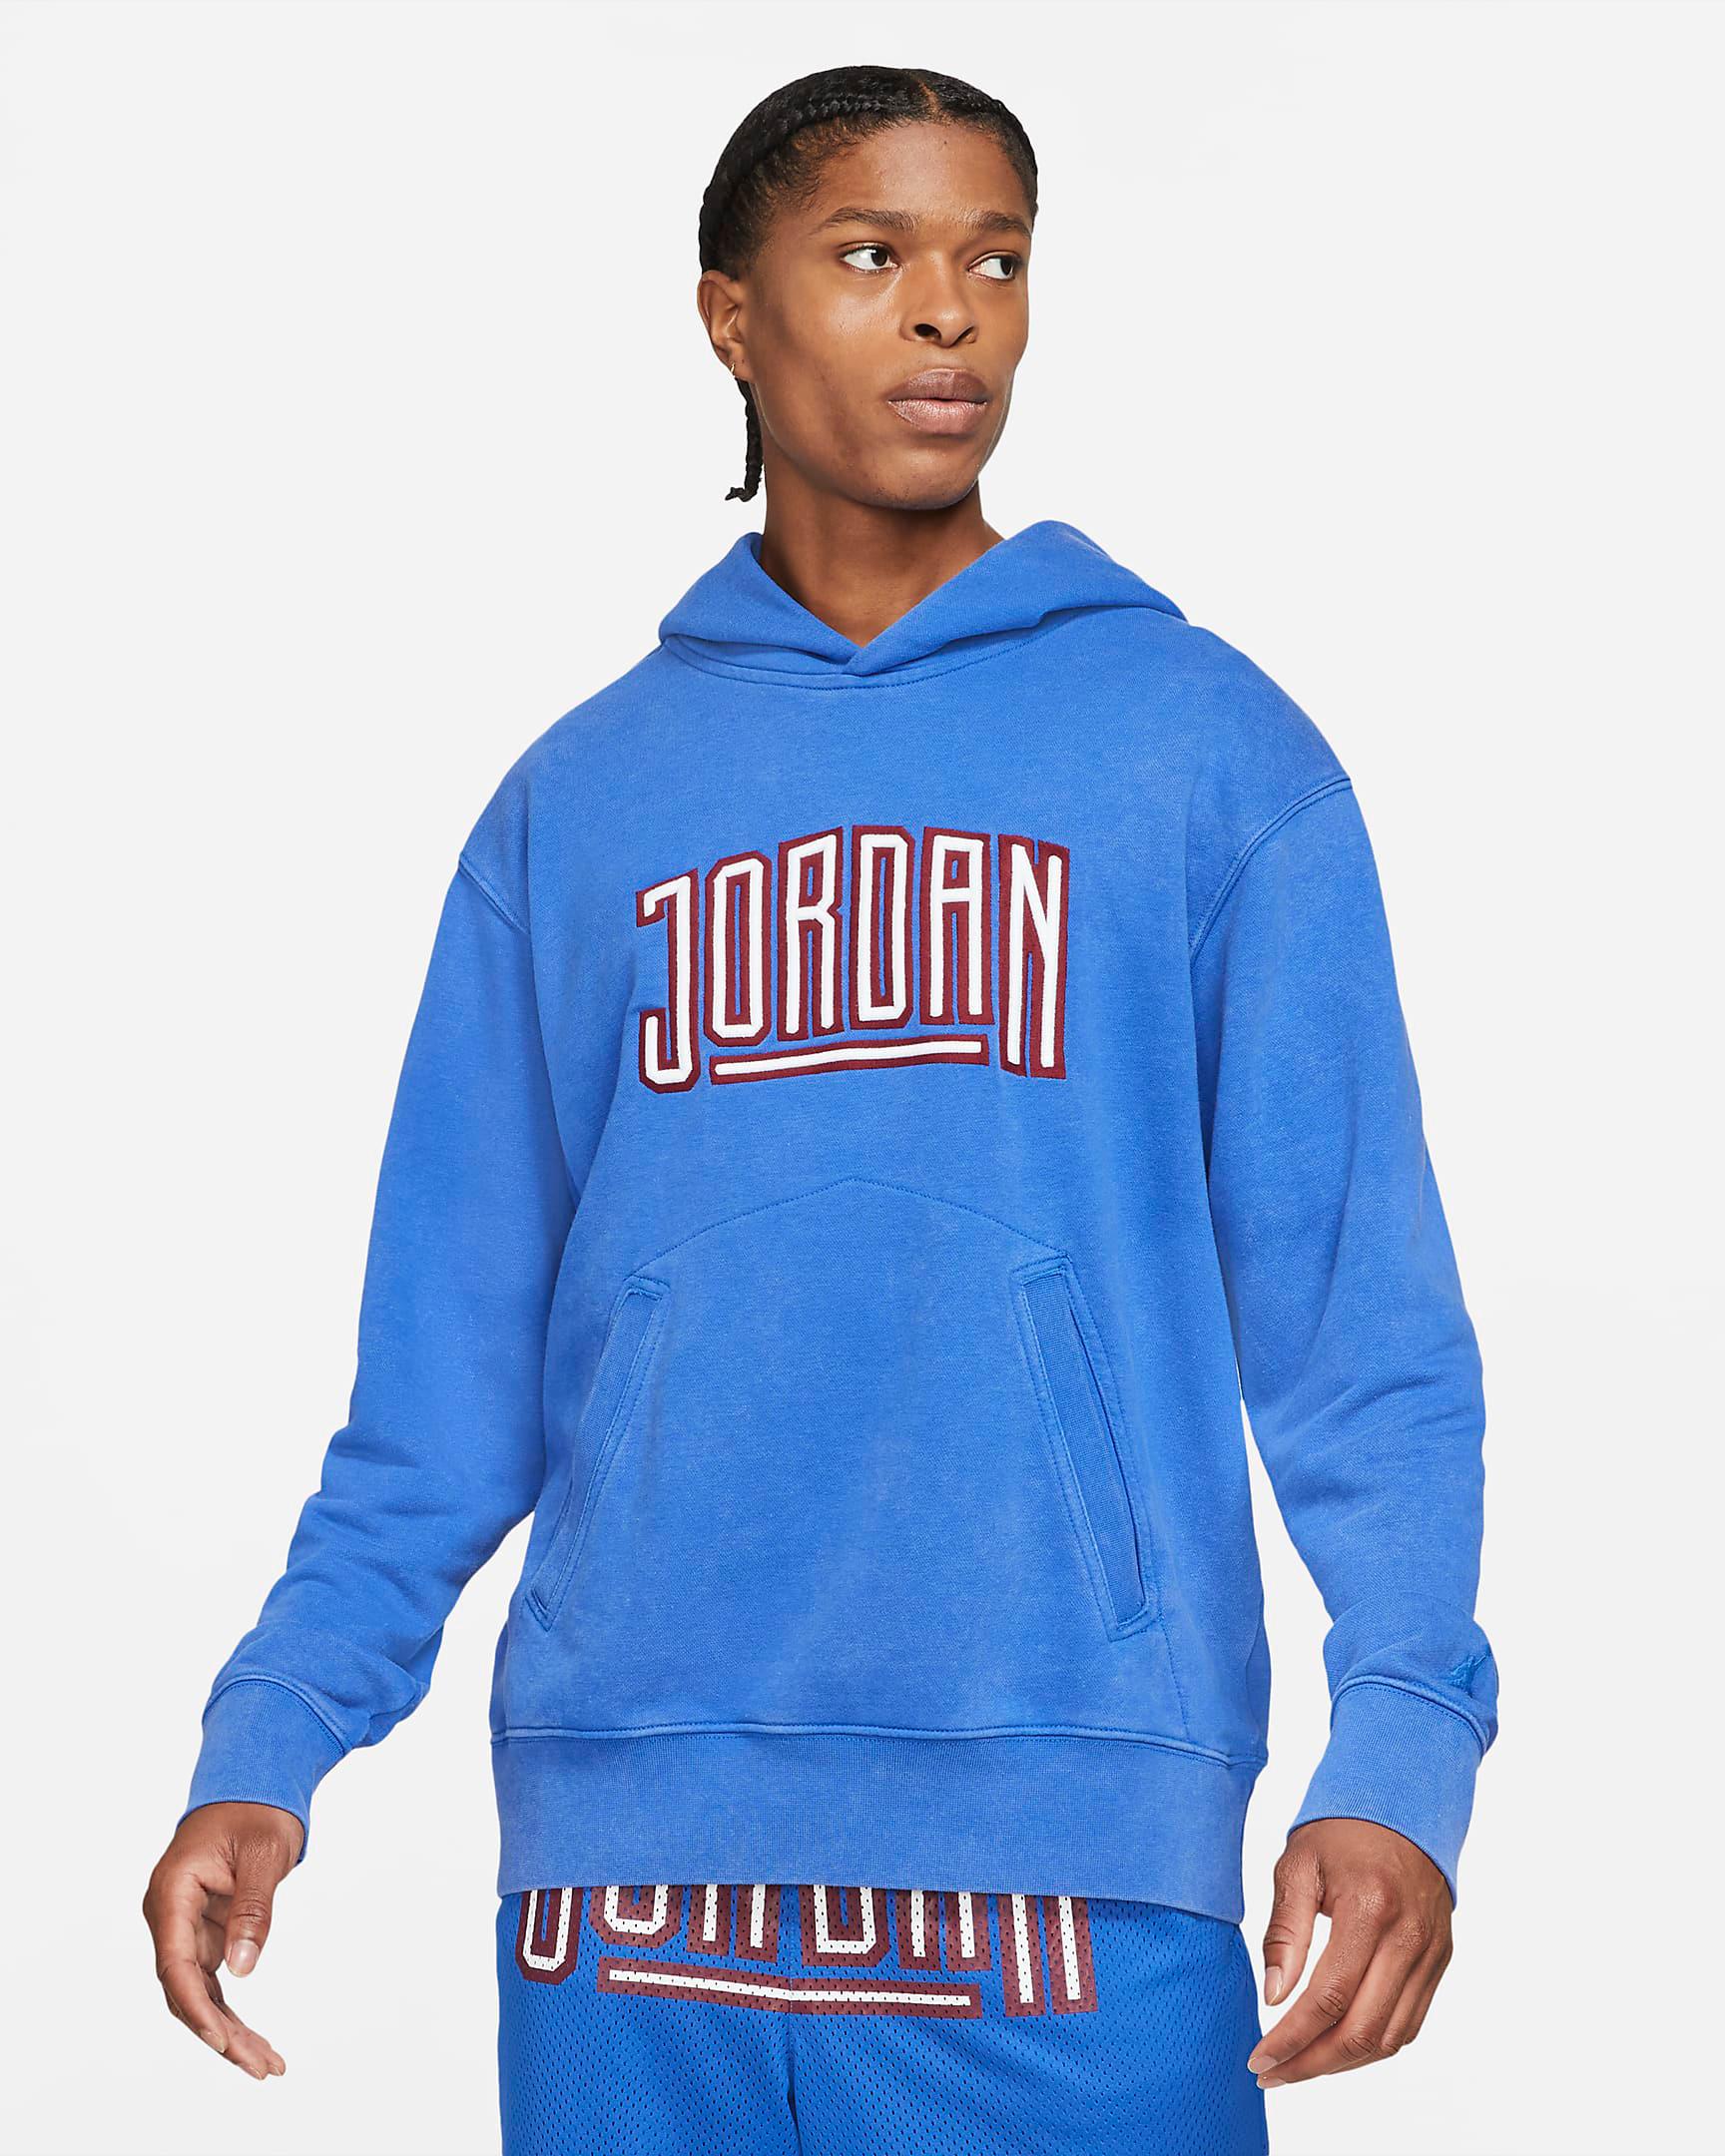 jordan-game-royal-sport-dna-hoodie-1